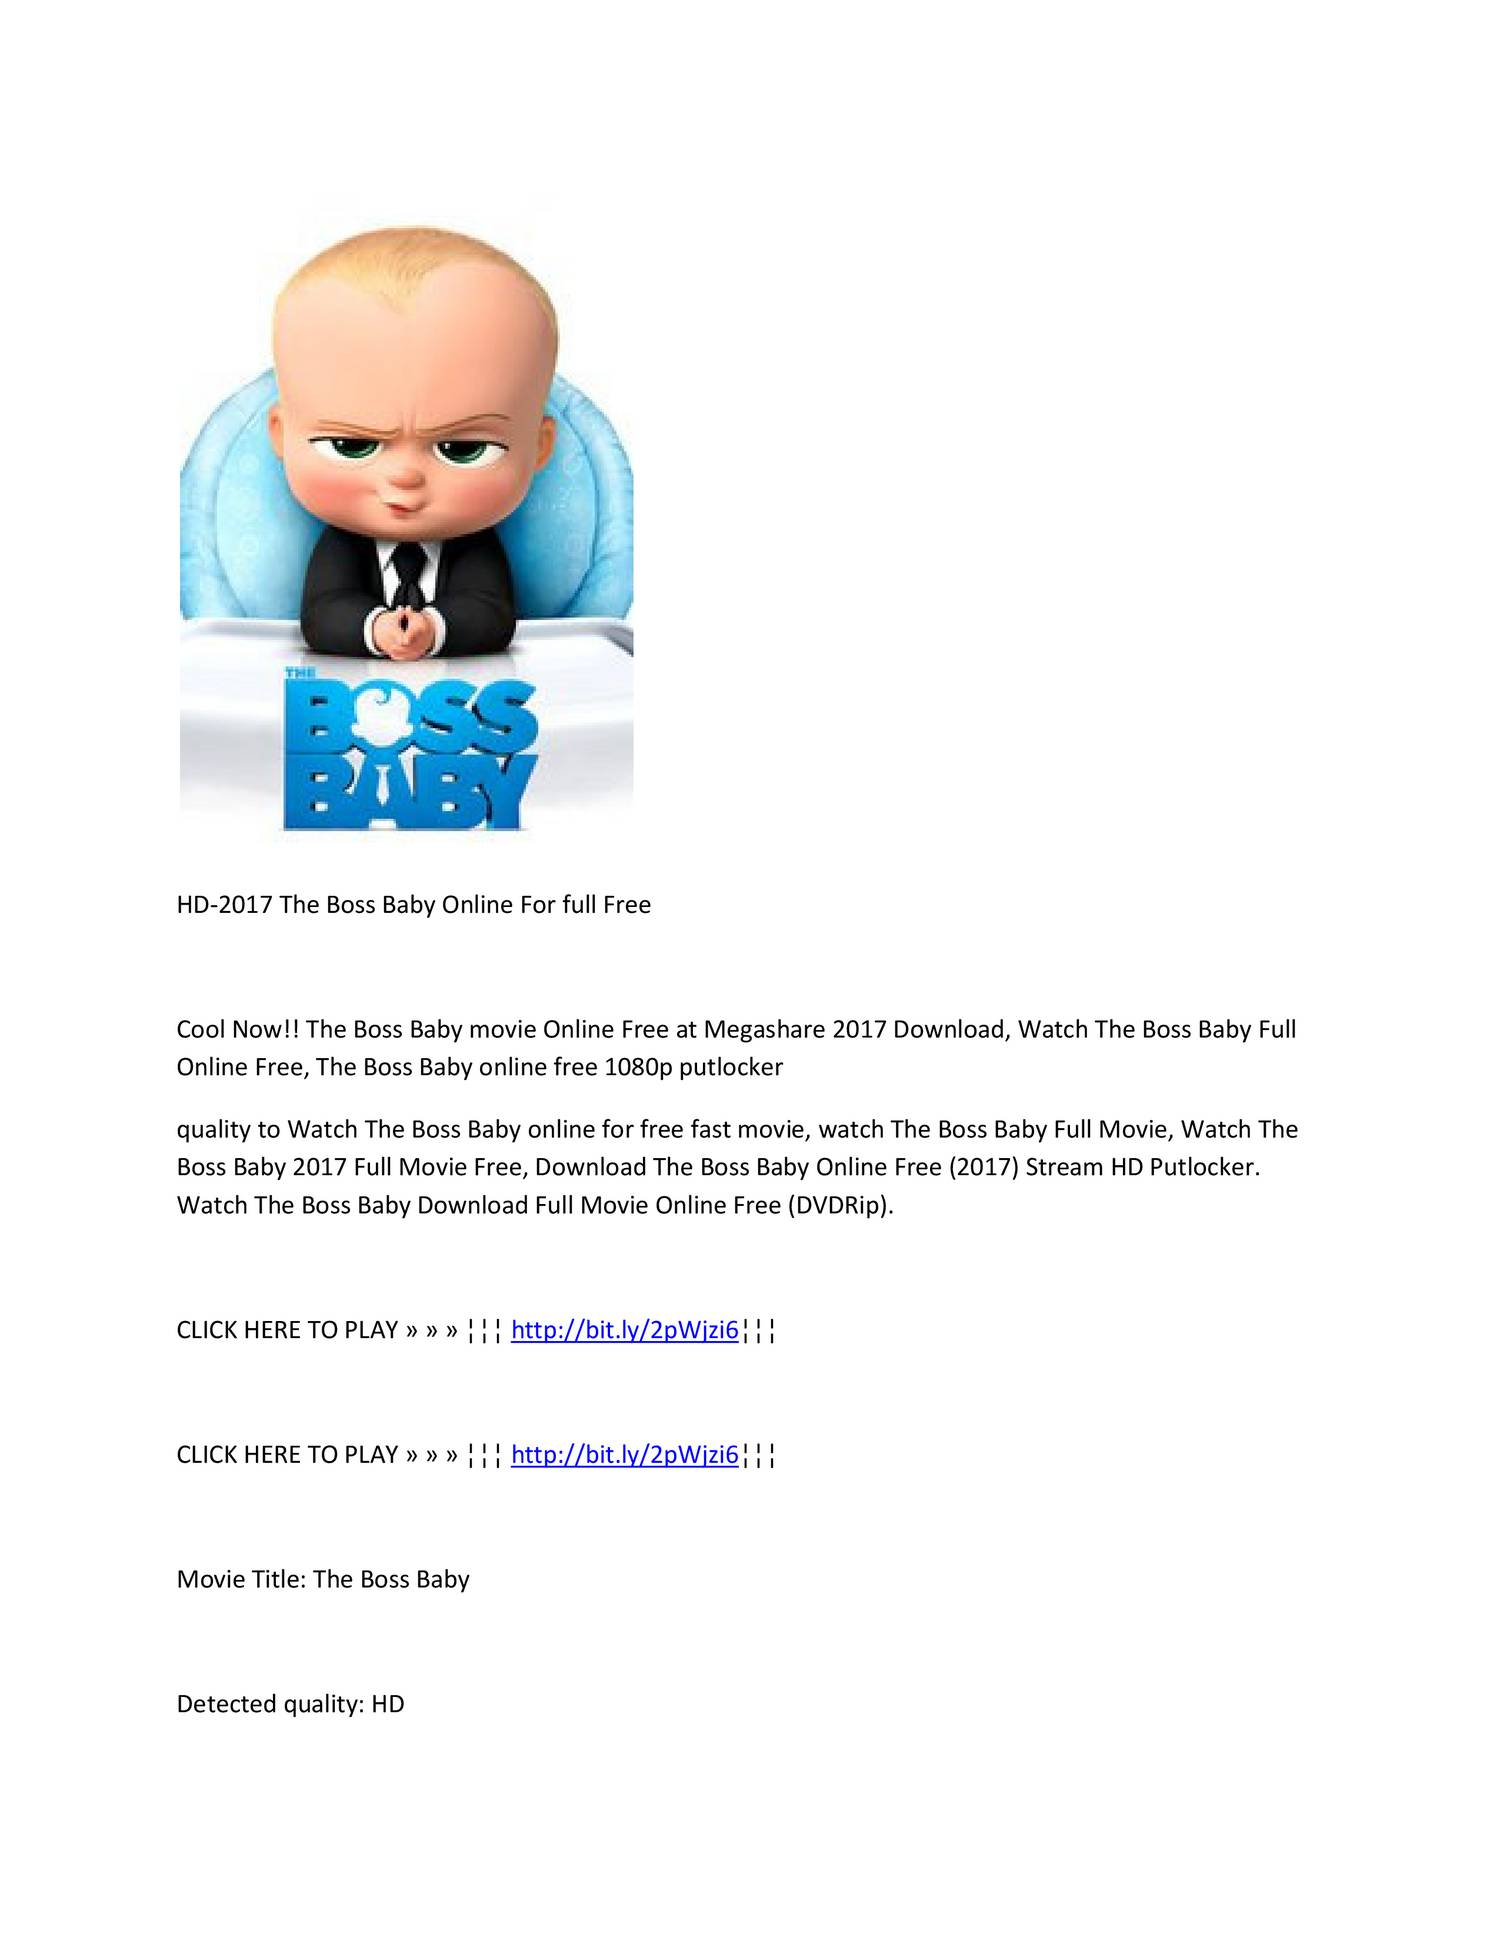 boss baby full movie hd online free